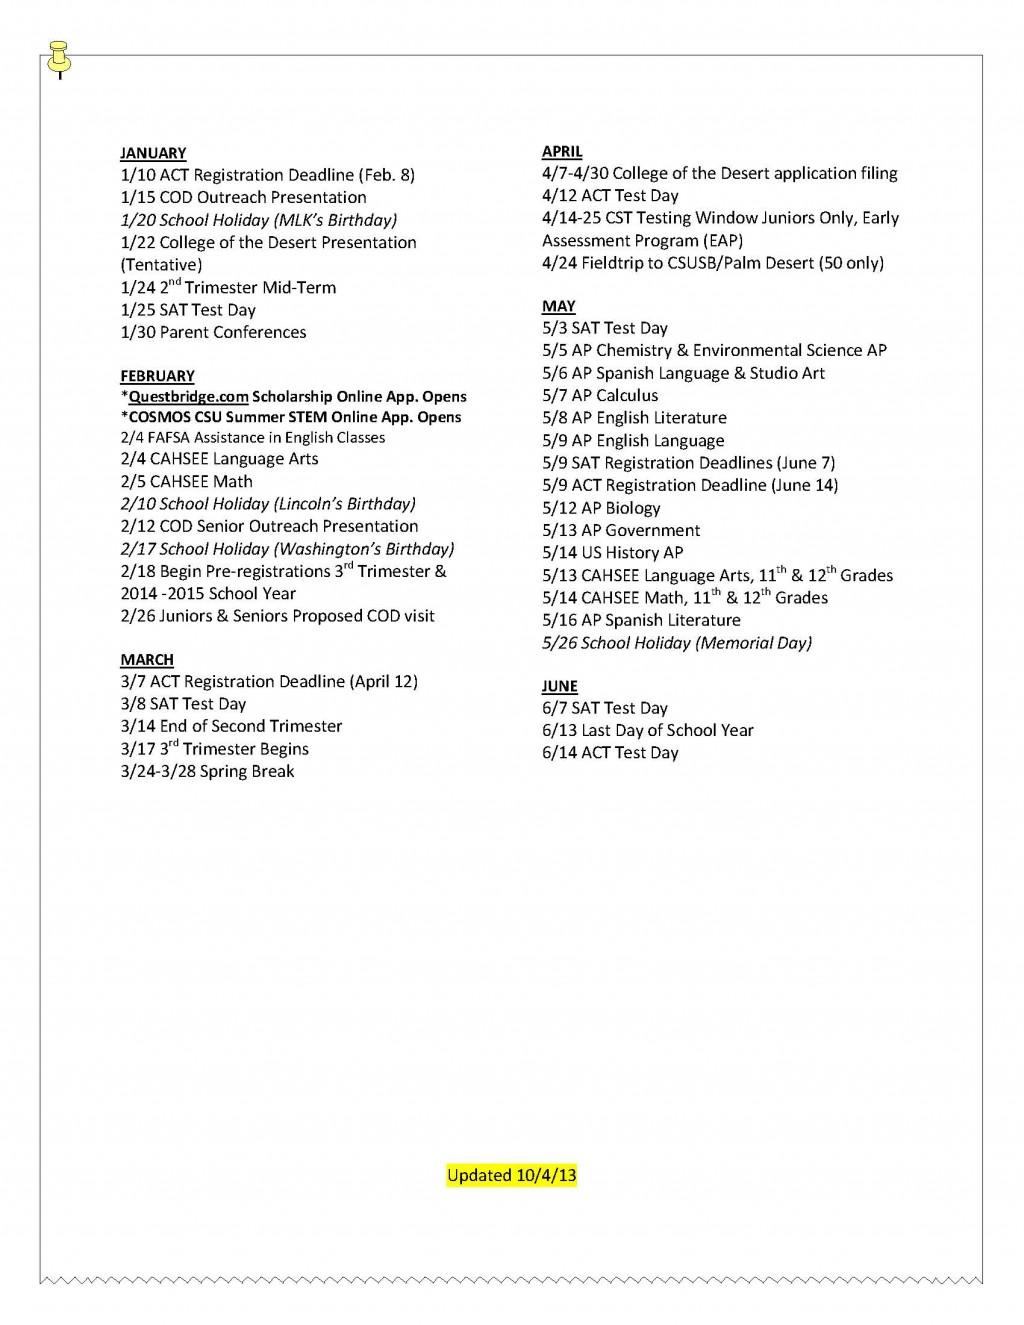 002 Spring Break Essay Junior20calendar2020152012 18 Page 2 Stupendous Plans Alternative Outline Large